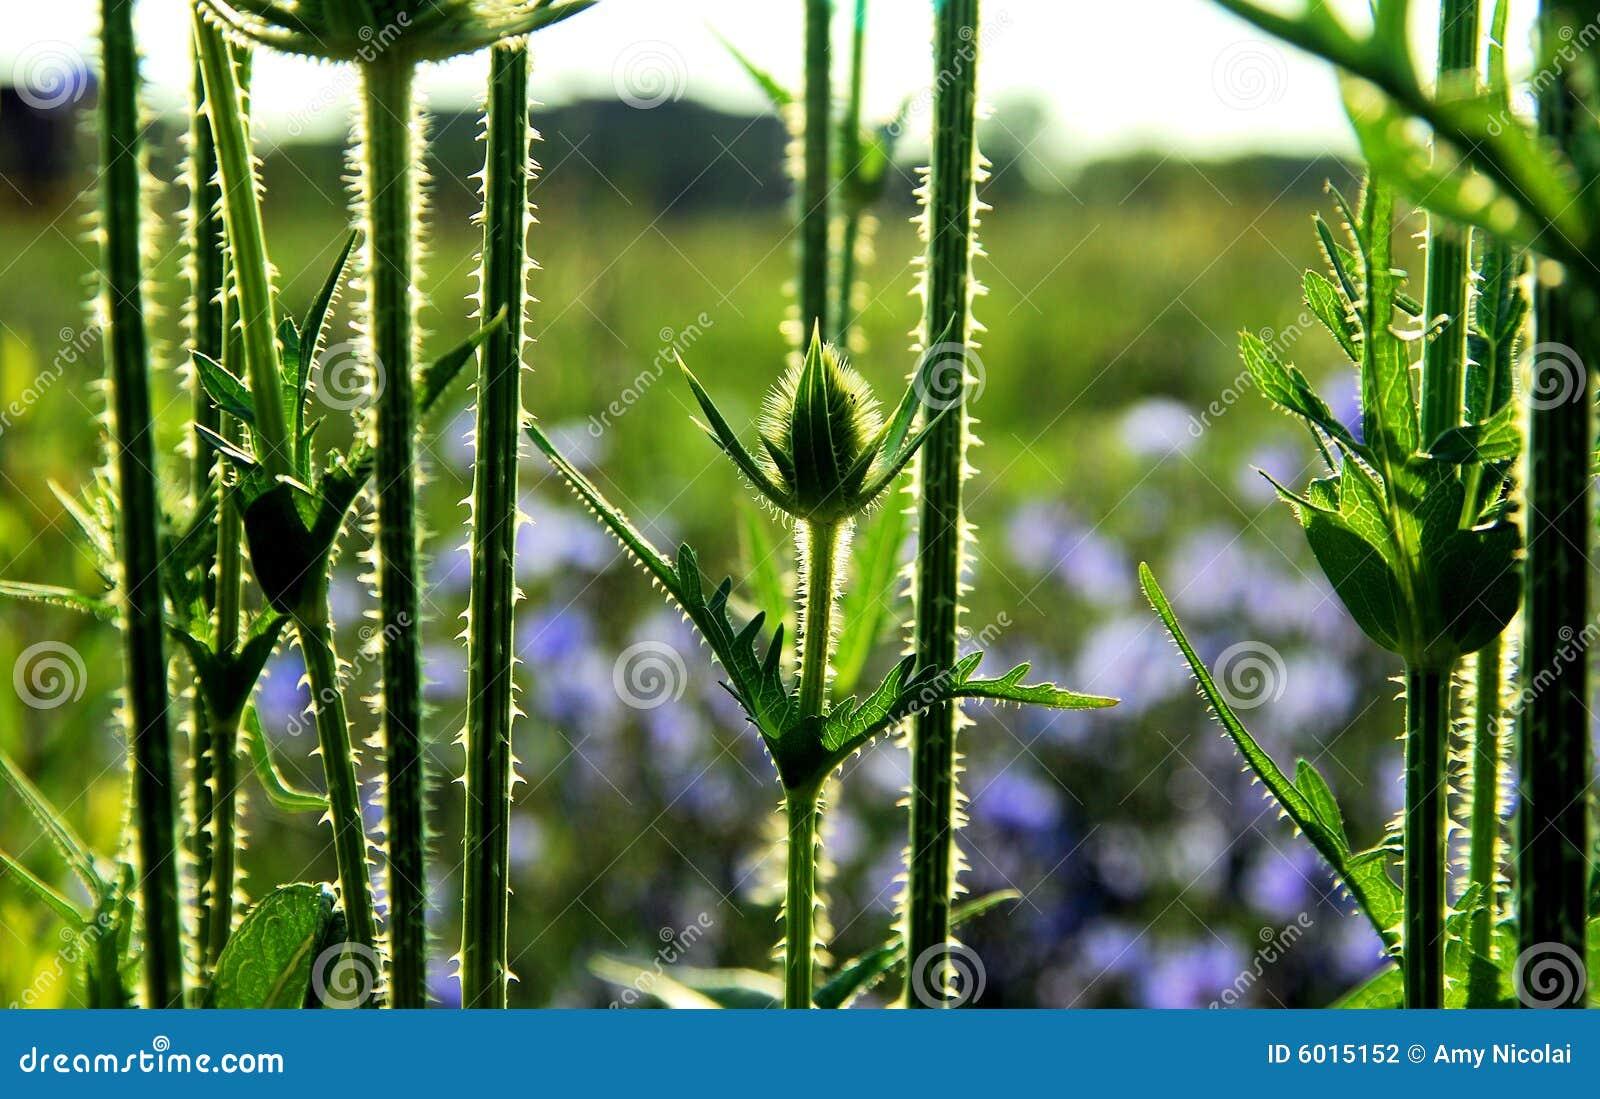 Teasel bud and stems